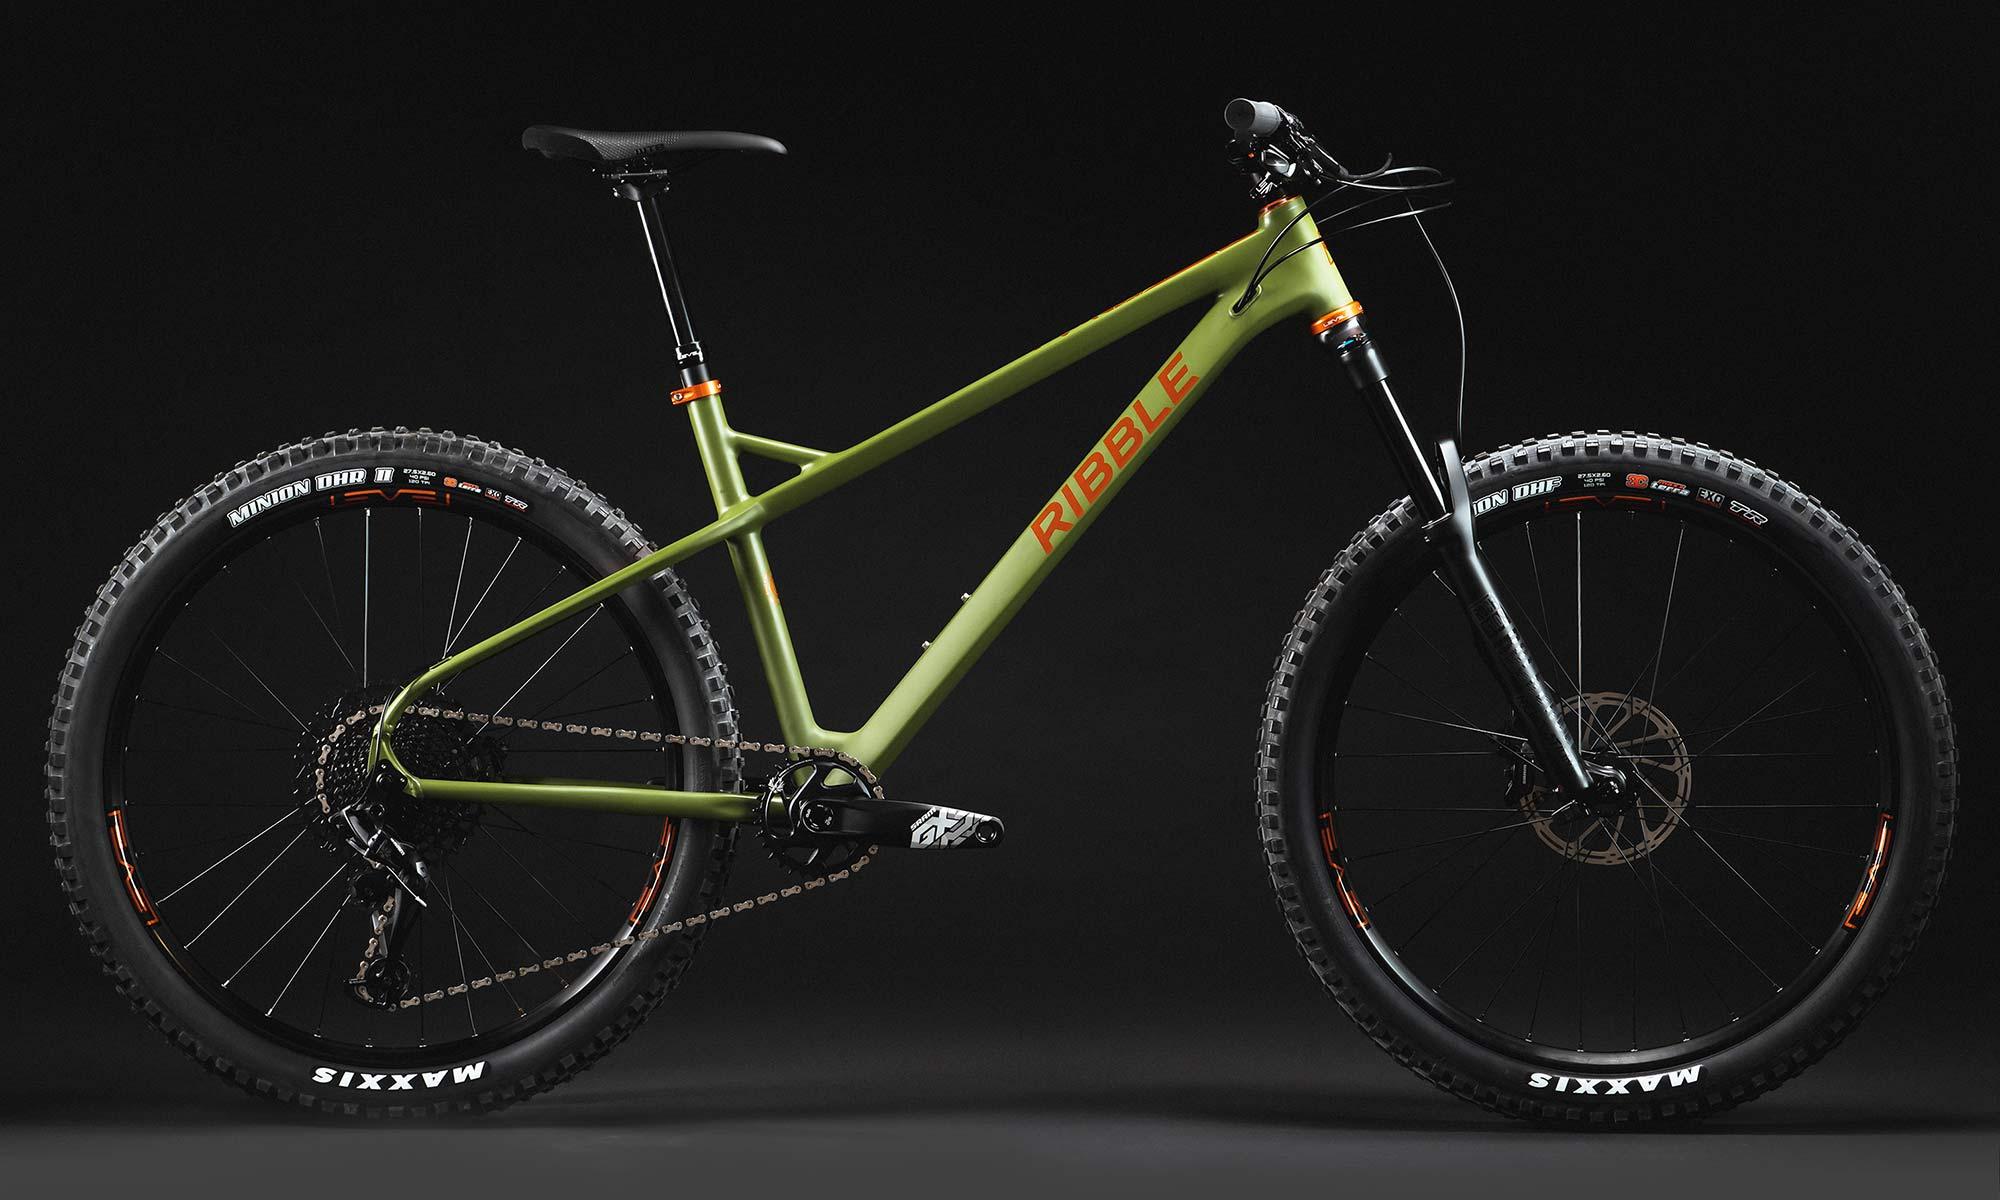 Ribble HT AL 27.5 enduro hardtail 150mm fork mountain bike,complete